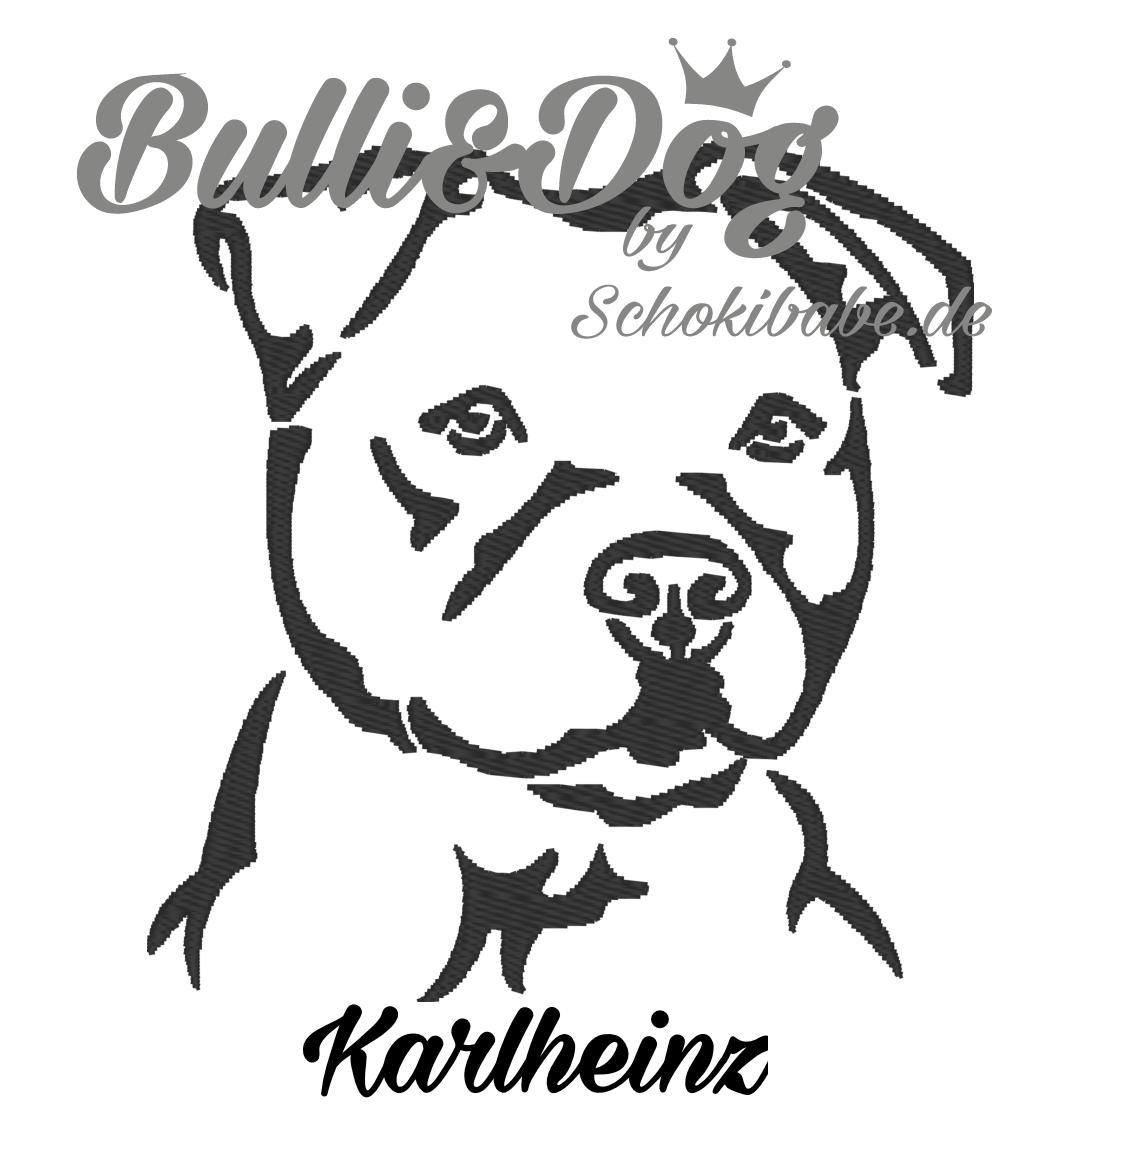 Karlheinz-7X7-Kopie5b5c22de39e11